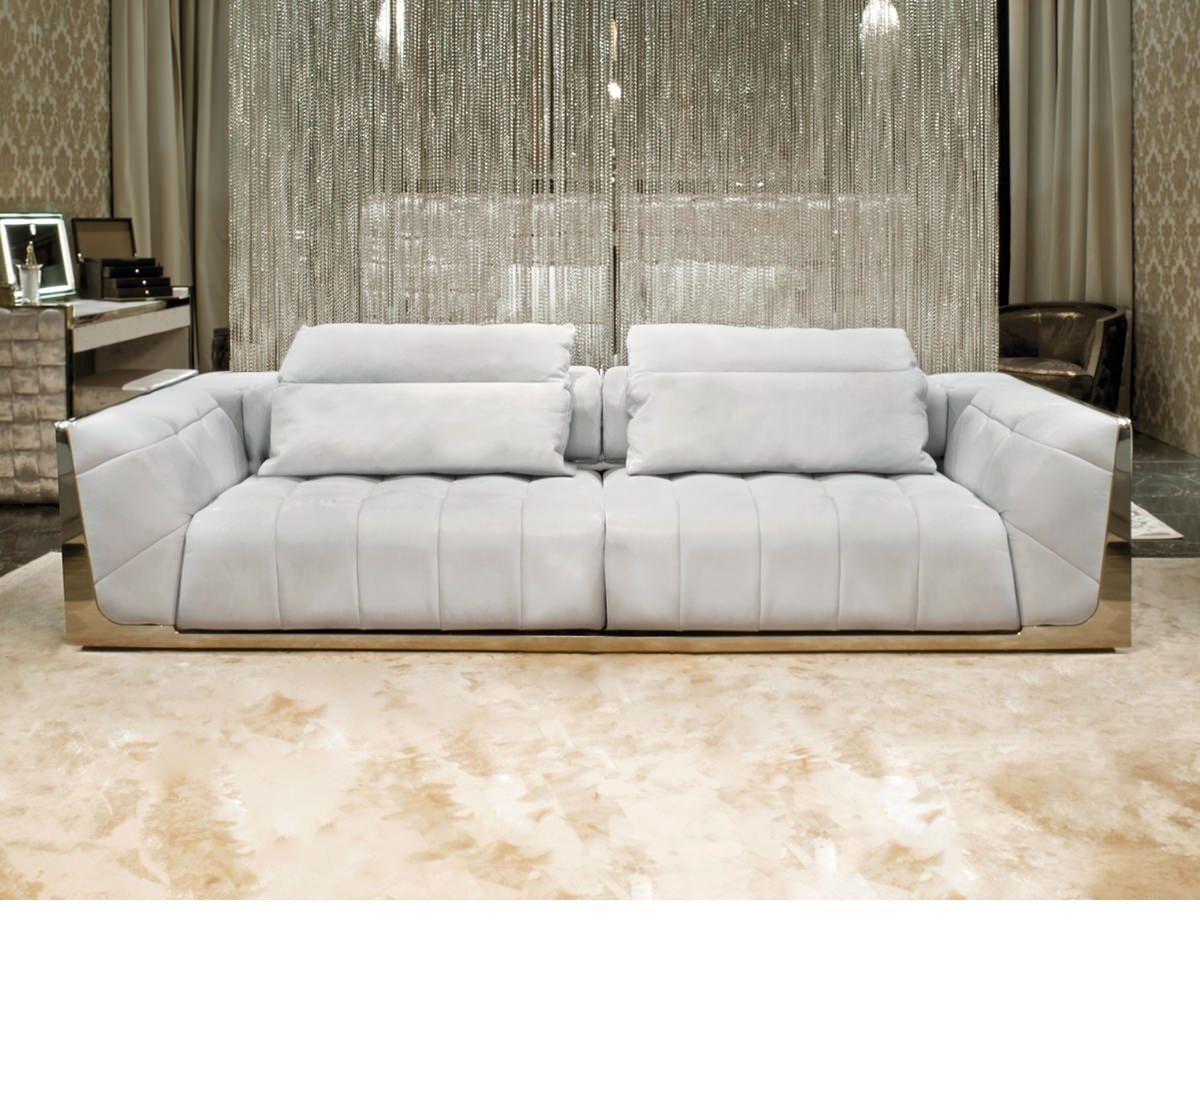 Luxury Lighting Luxury Furniture Luxury Home Decor Luxury